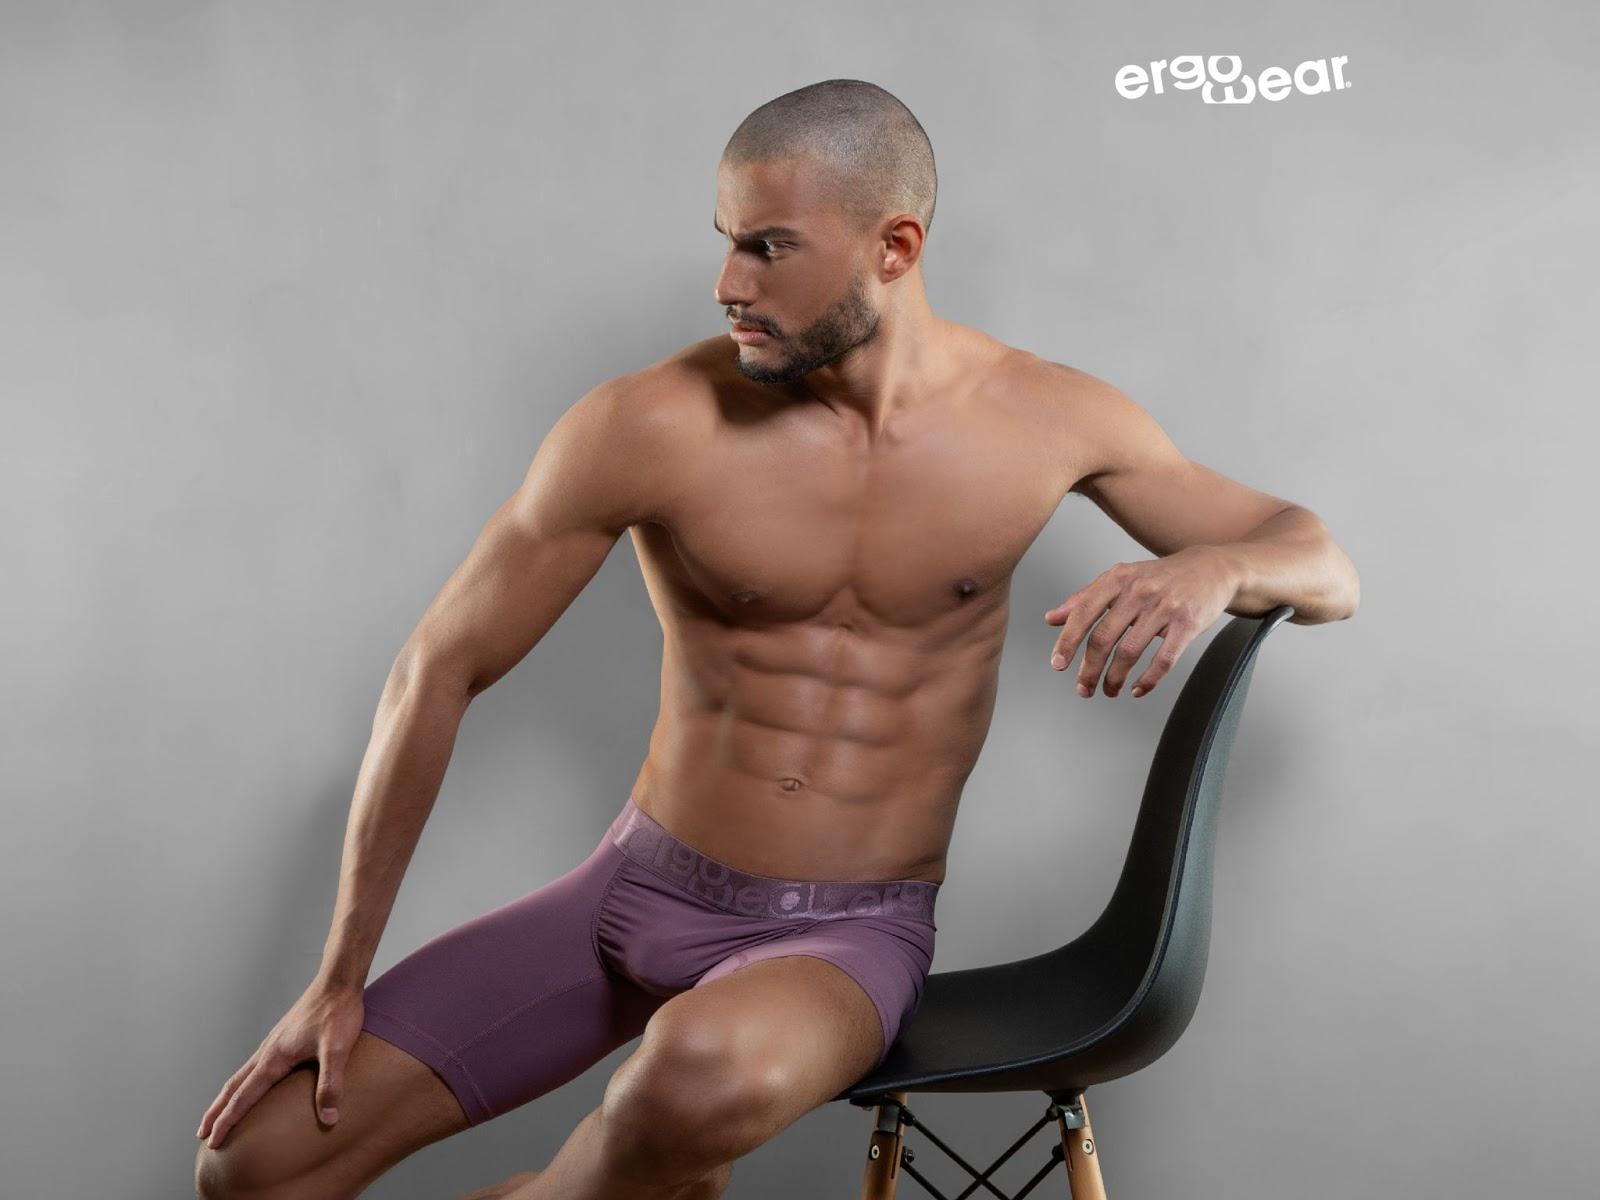 Front-Facing Underwear For Men - Ergowear